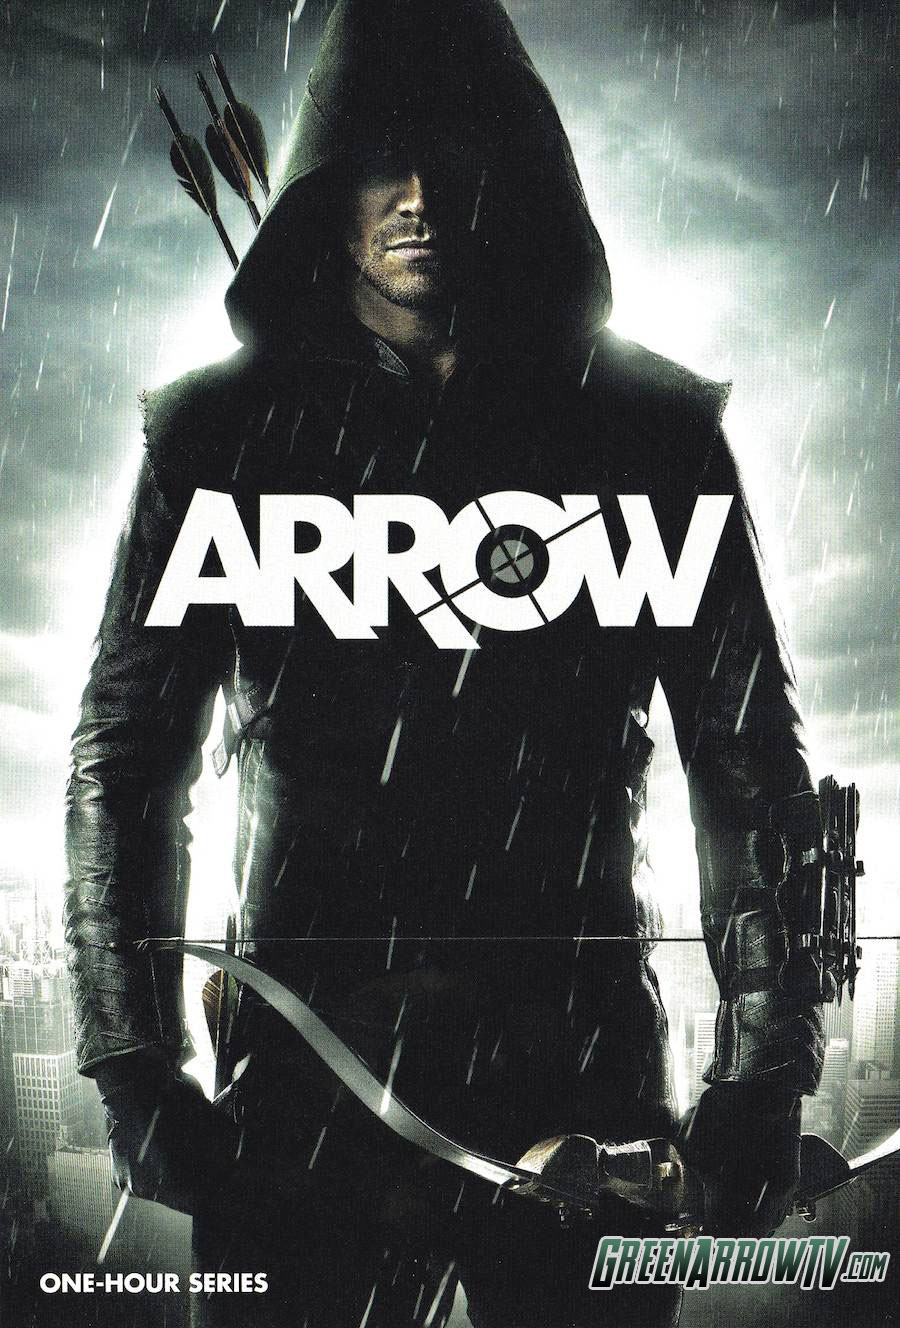 Arrow S06 E06